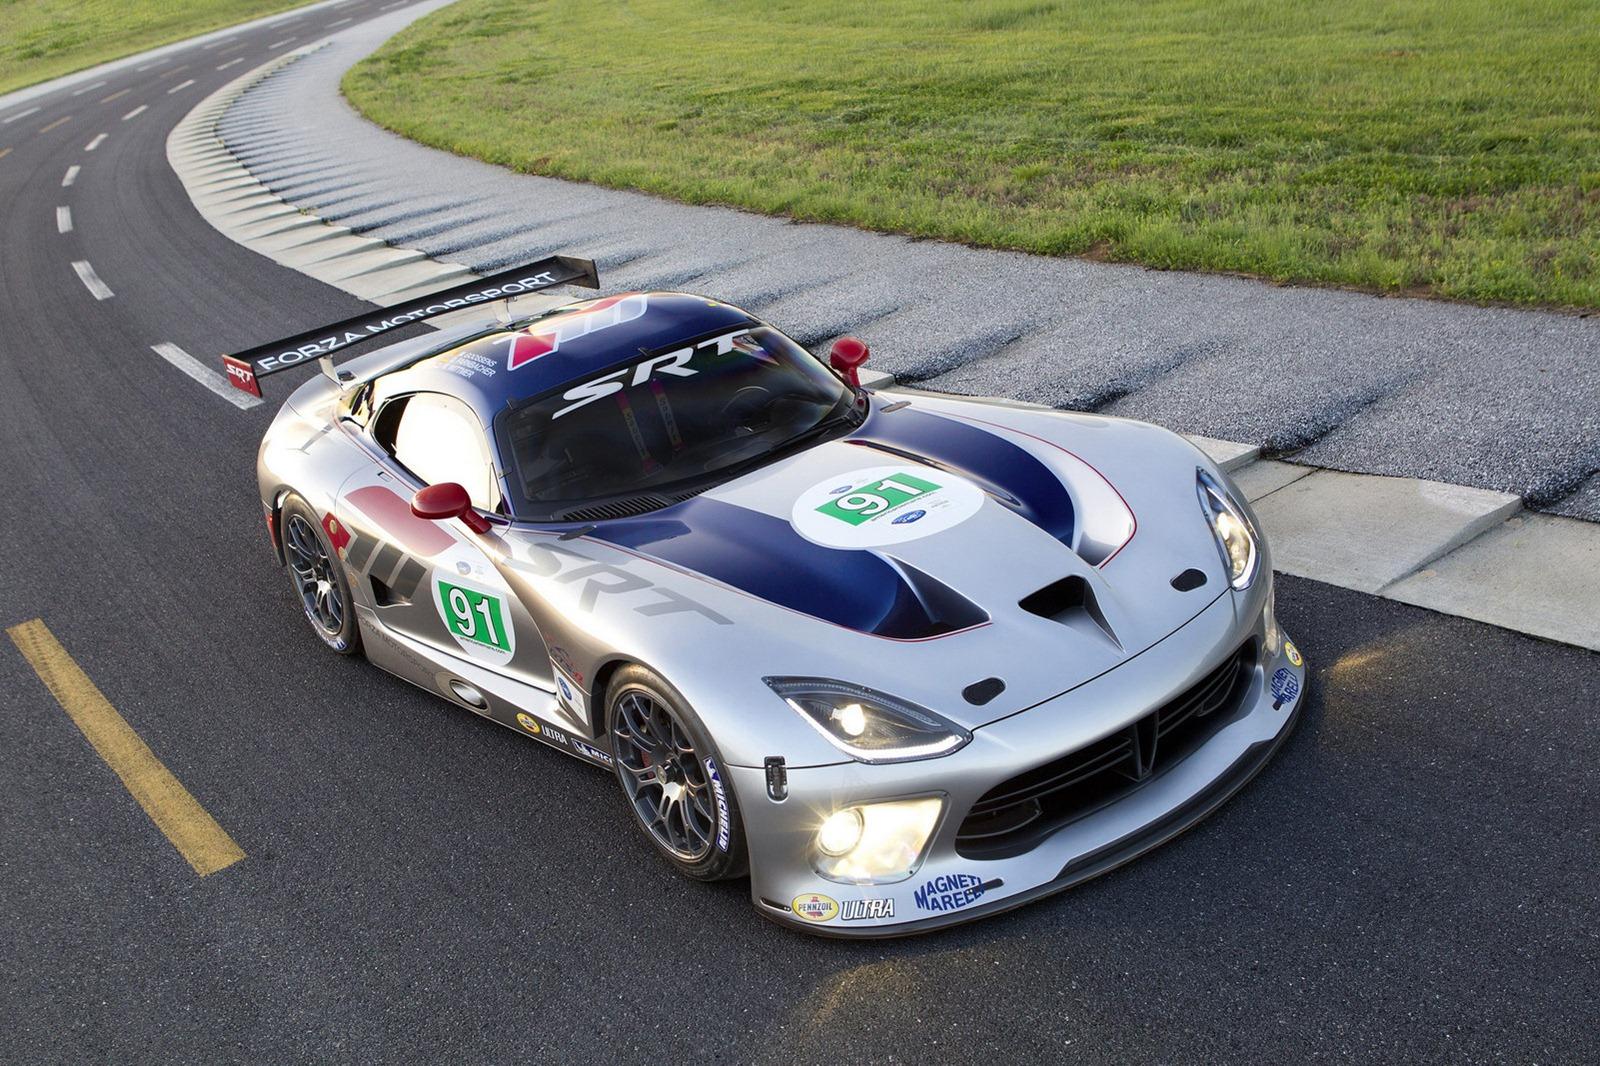 Srt viper gts r chrysler 39 s return to le mans racing autoevolution